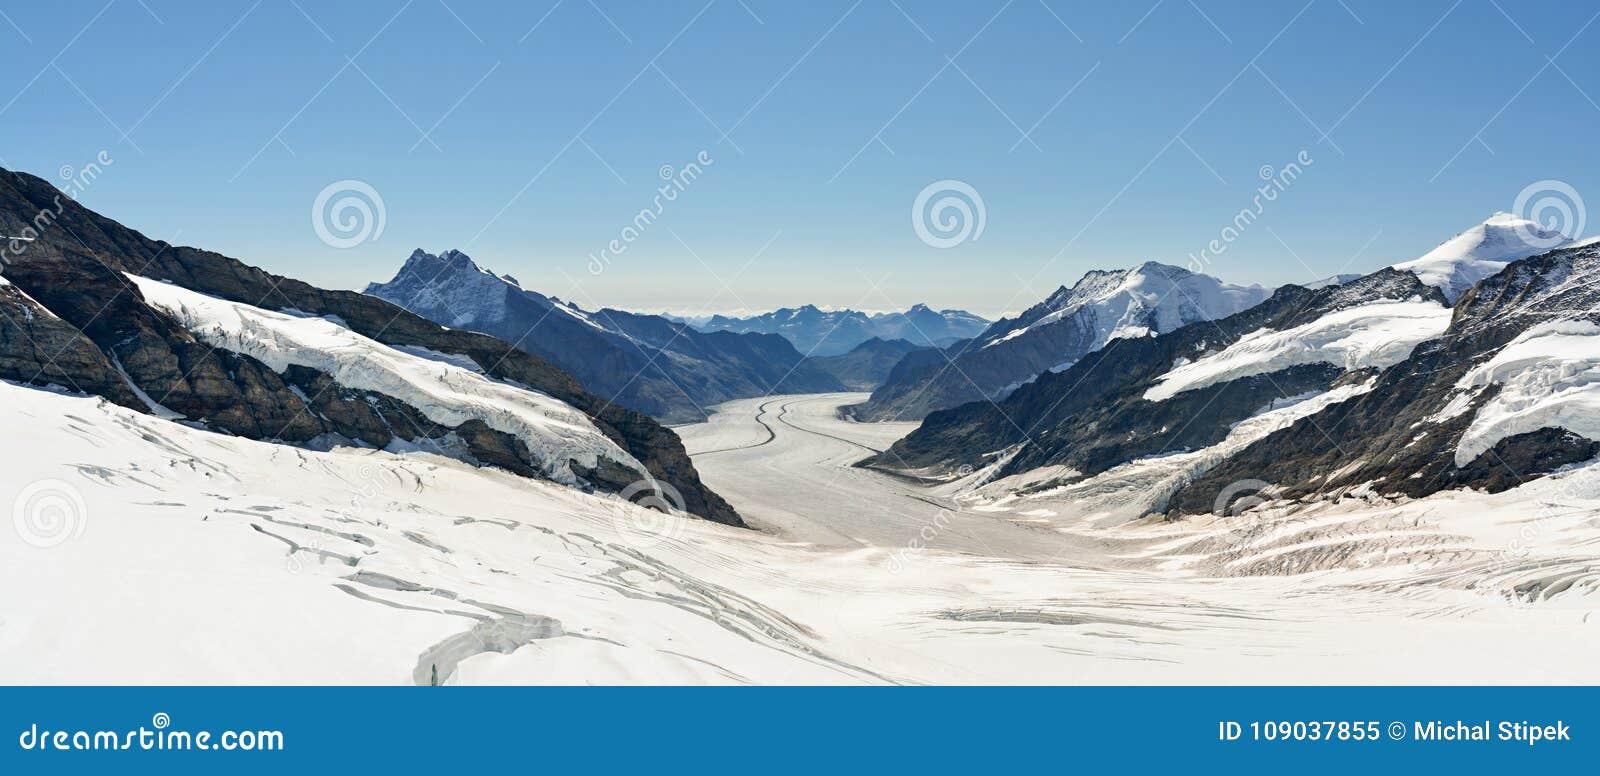 Beautiful Aletsch glacier in Switzerland